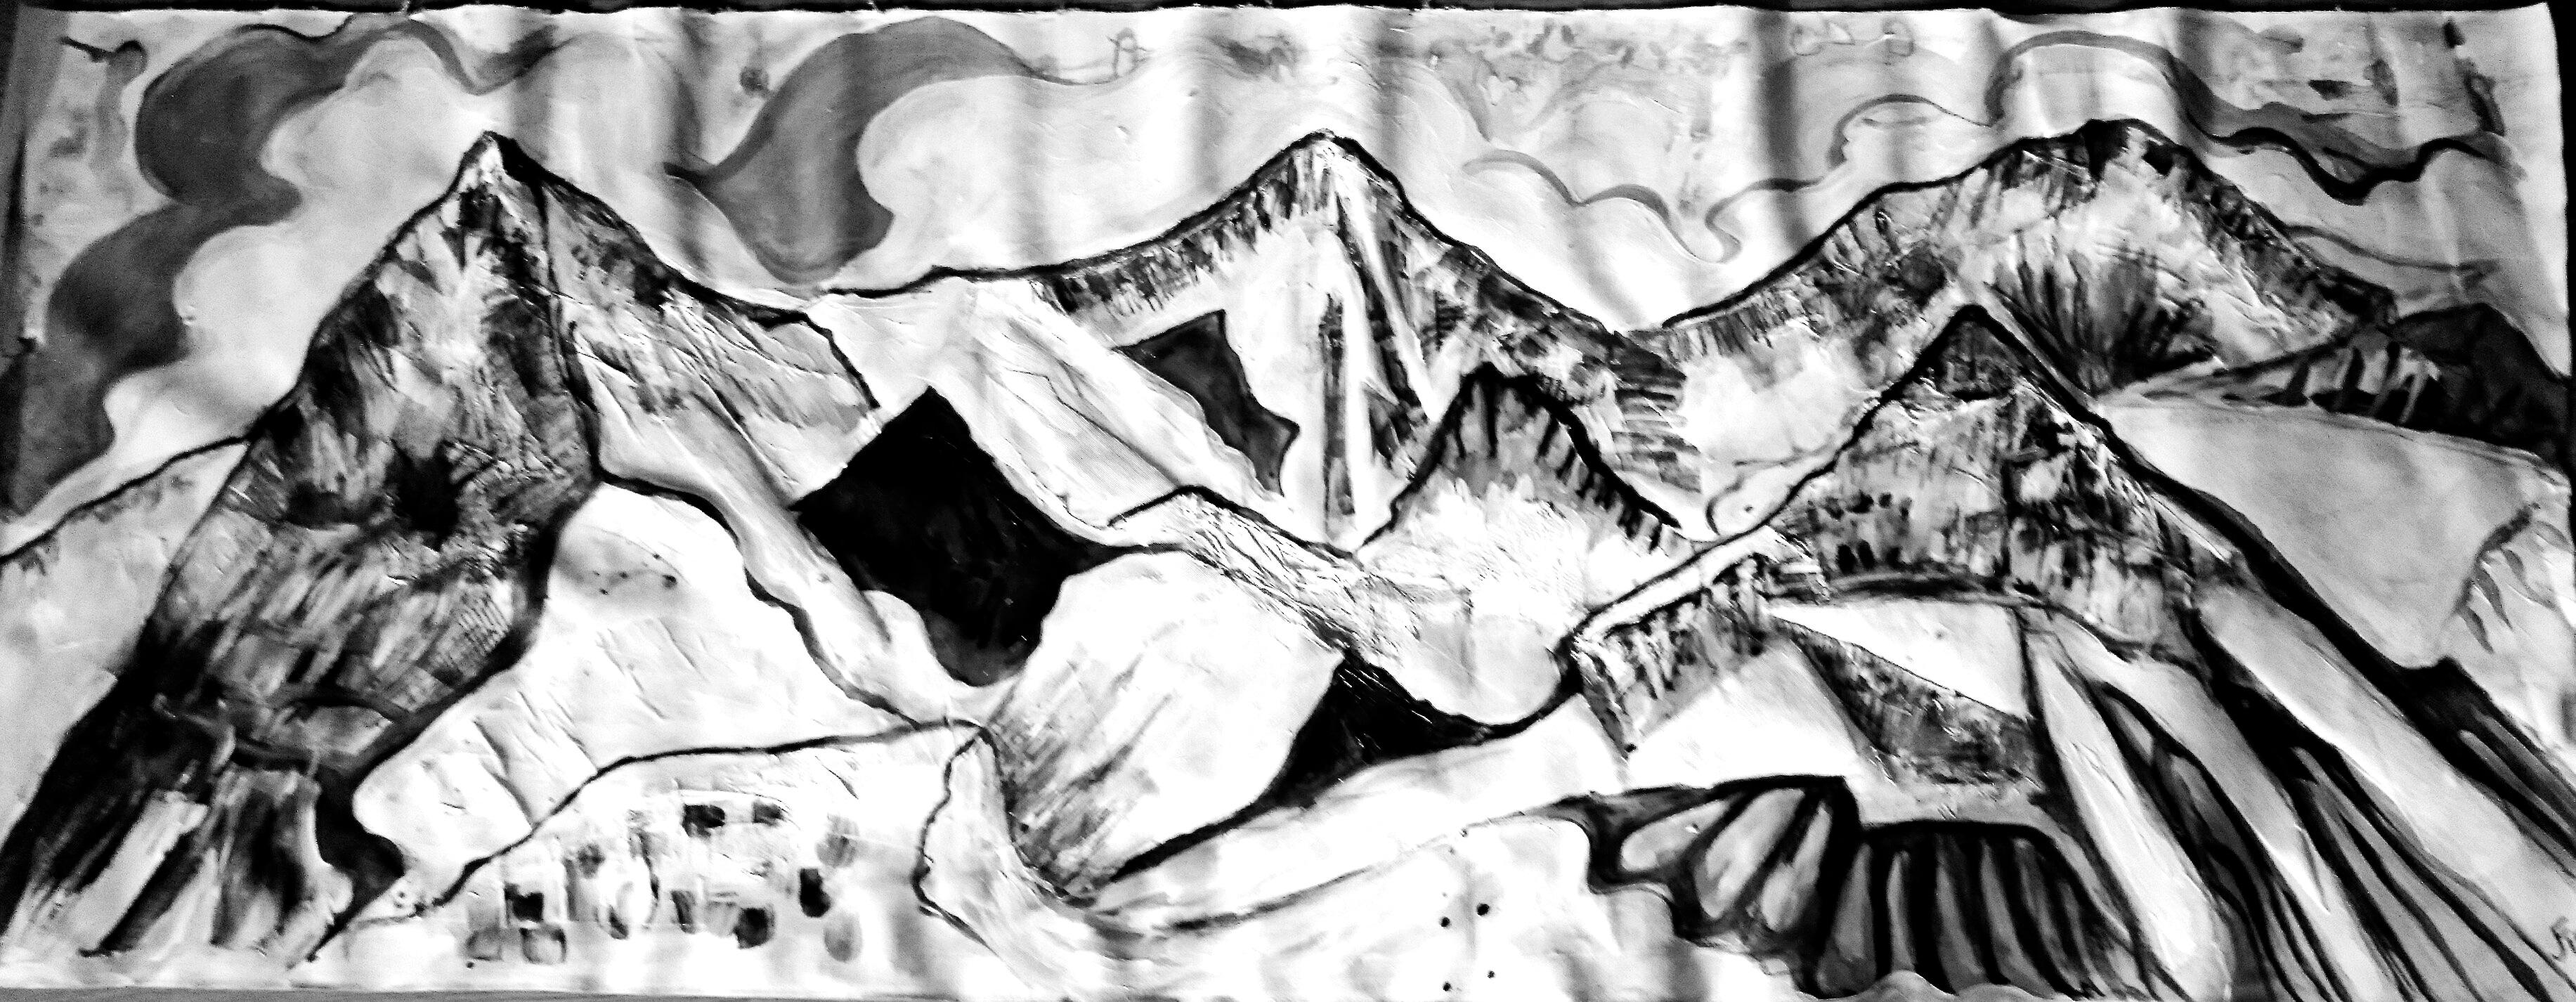 Eiger Range